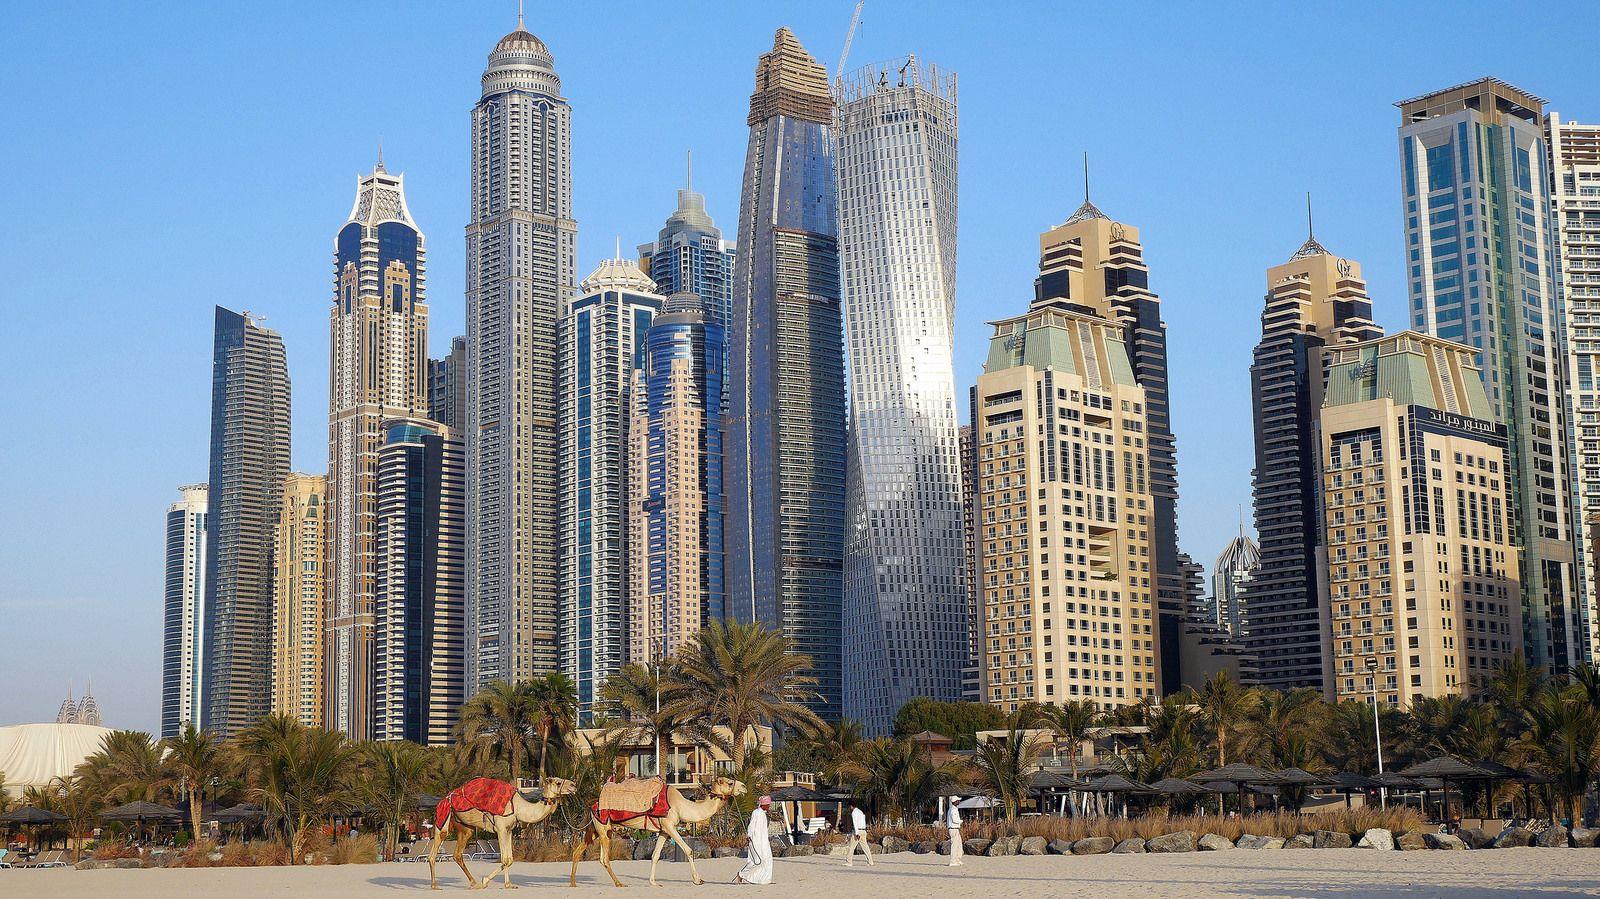 DUBAI | DAMAC Residenze | 335m | 1100ft | 88 fl | T/O - Page 88 - SkyscraperCity